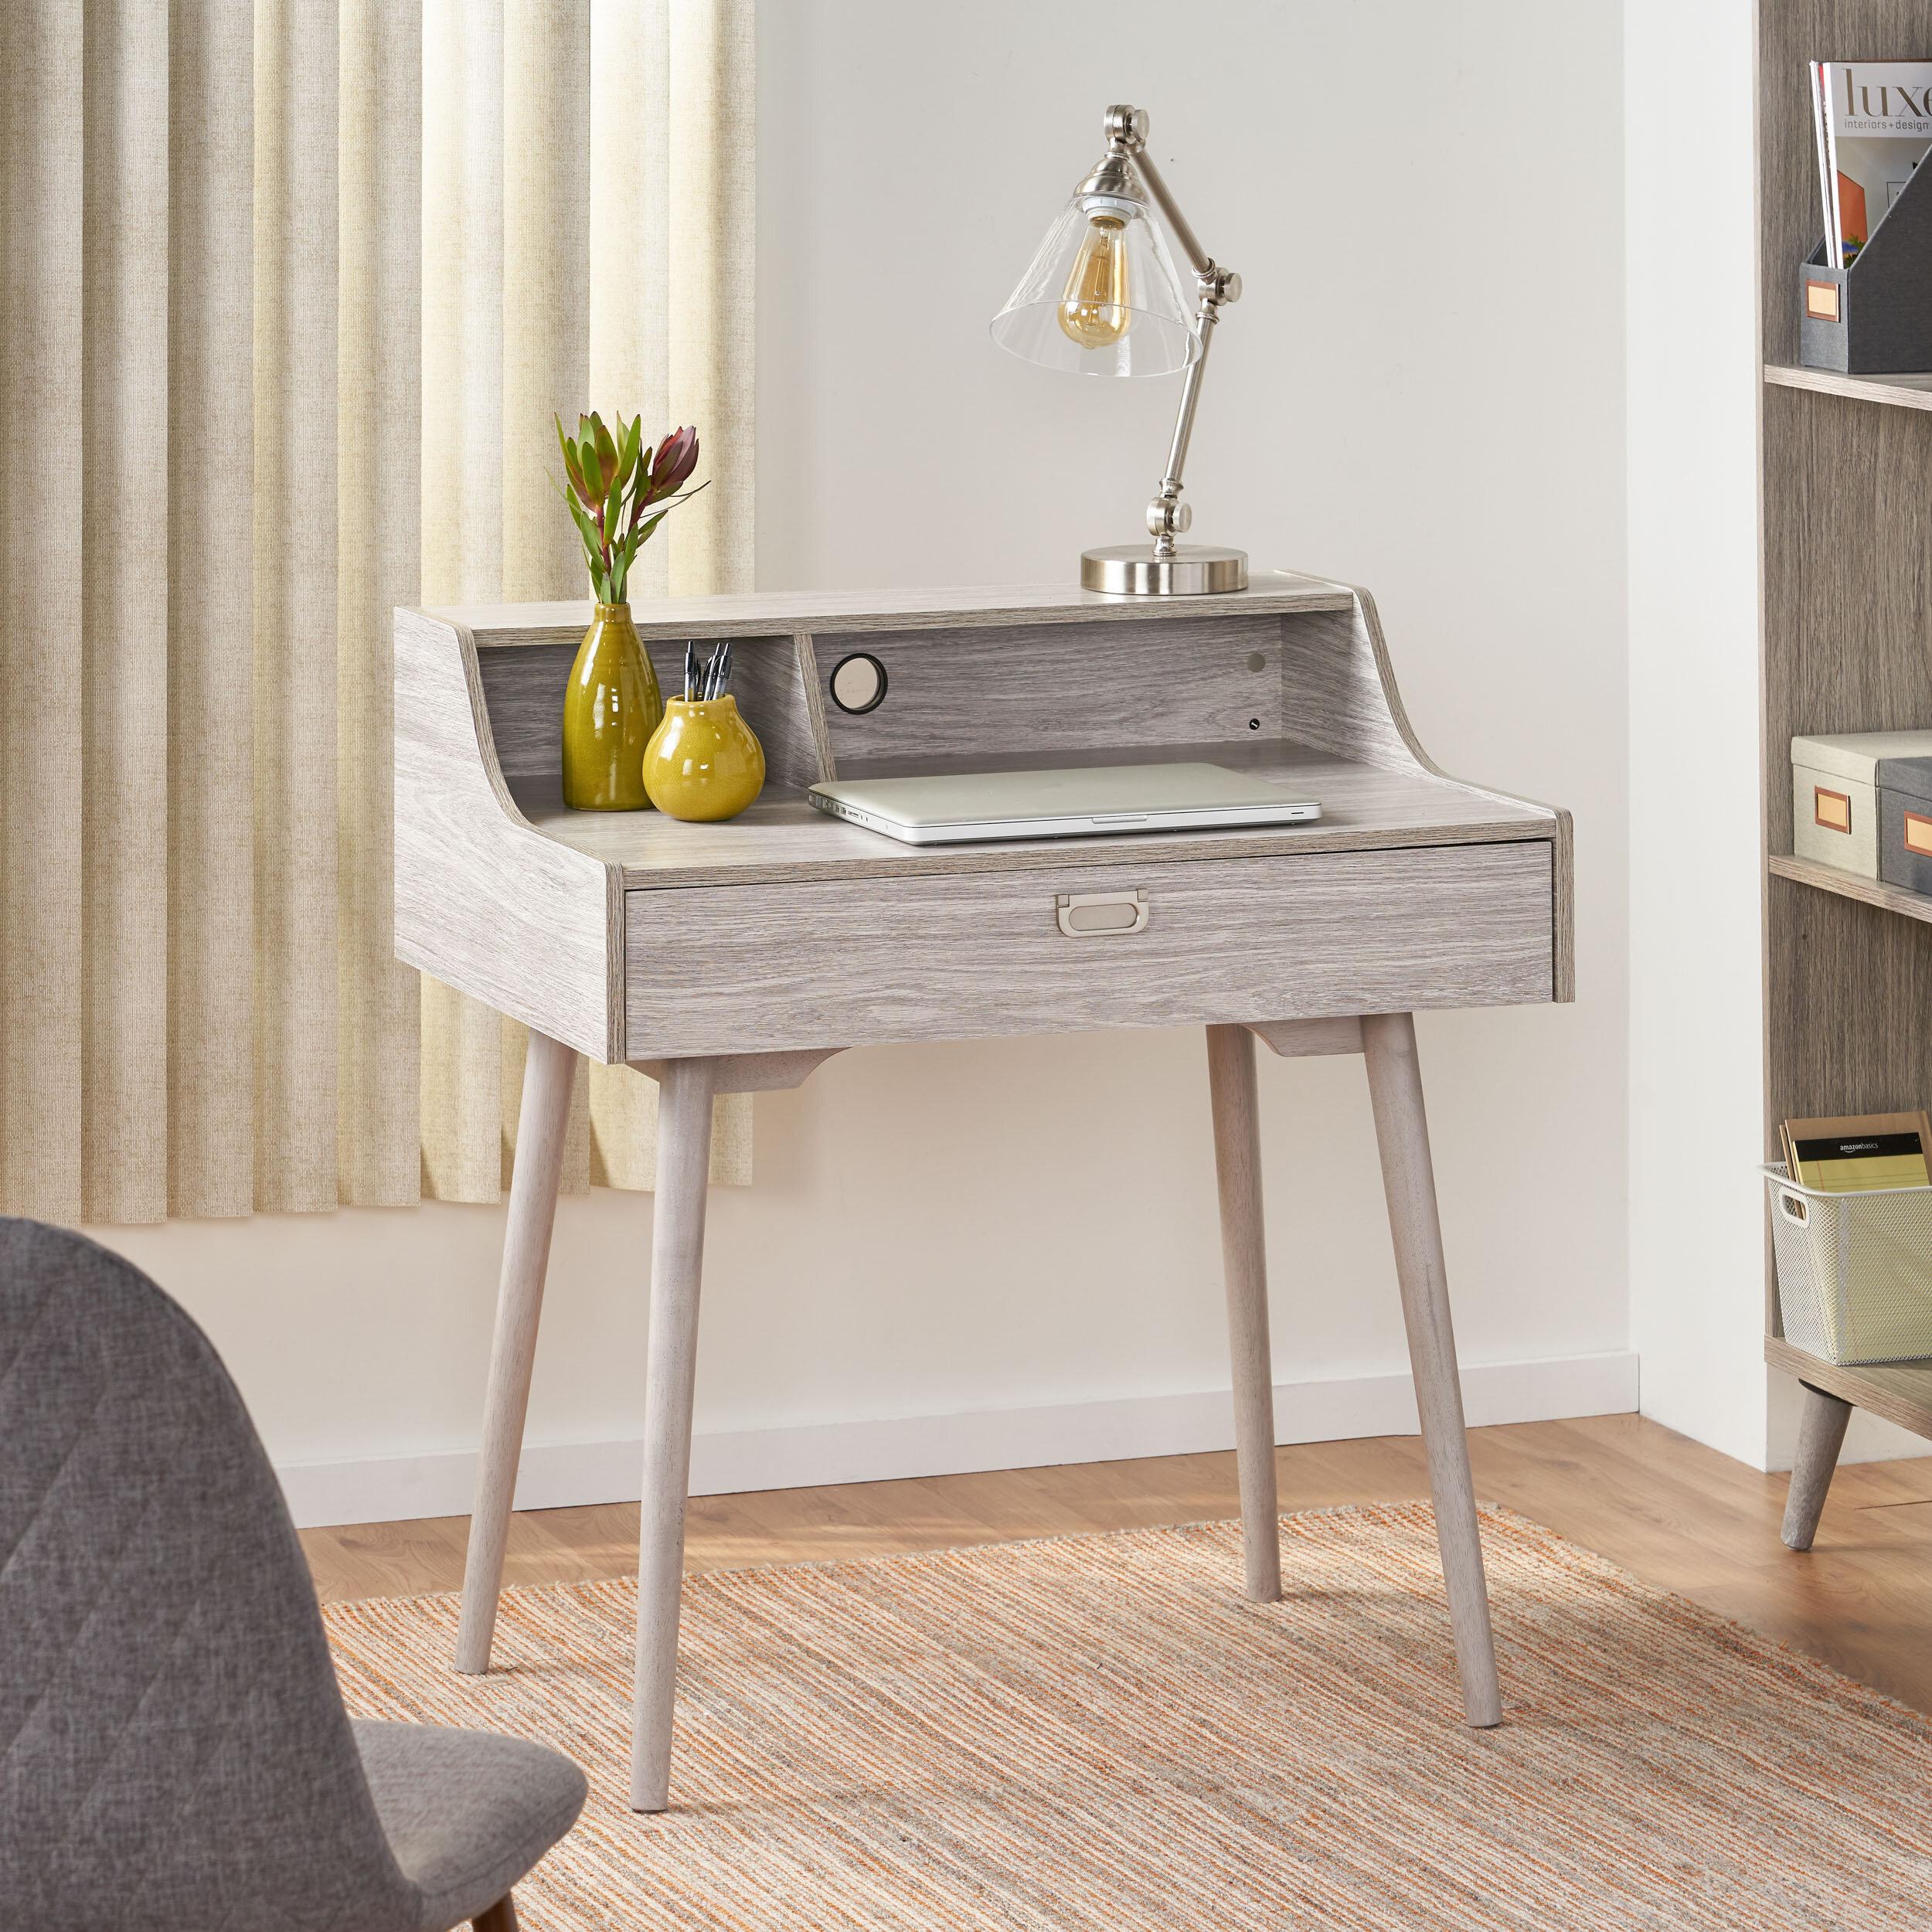 Picture of: Mid Century Modern Secretary Roll Top Desks You Ll Love In 2020 Wayfair